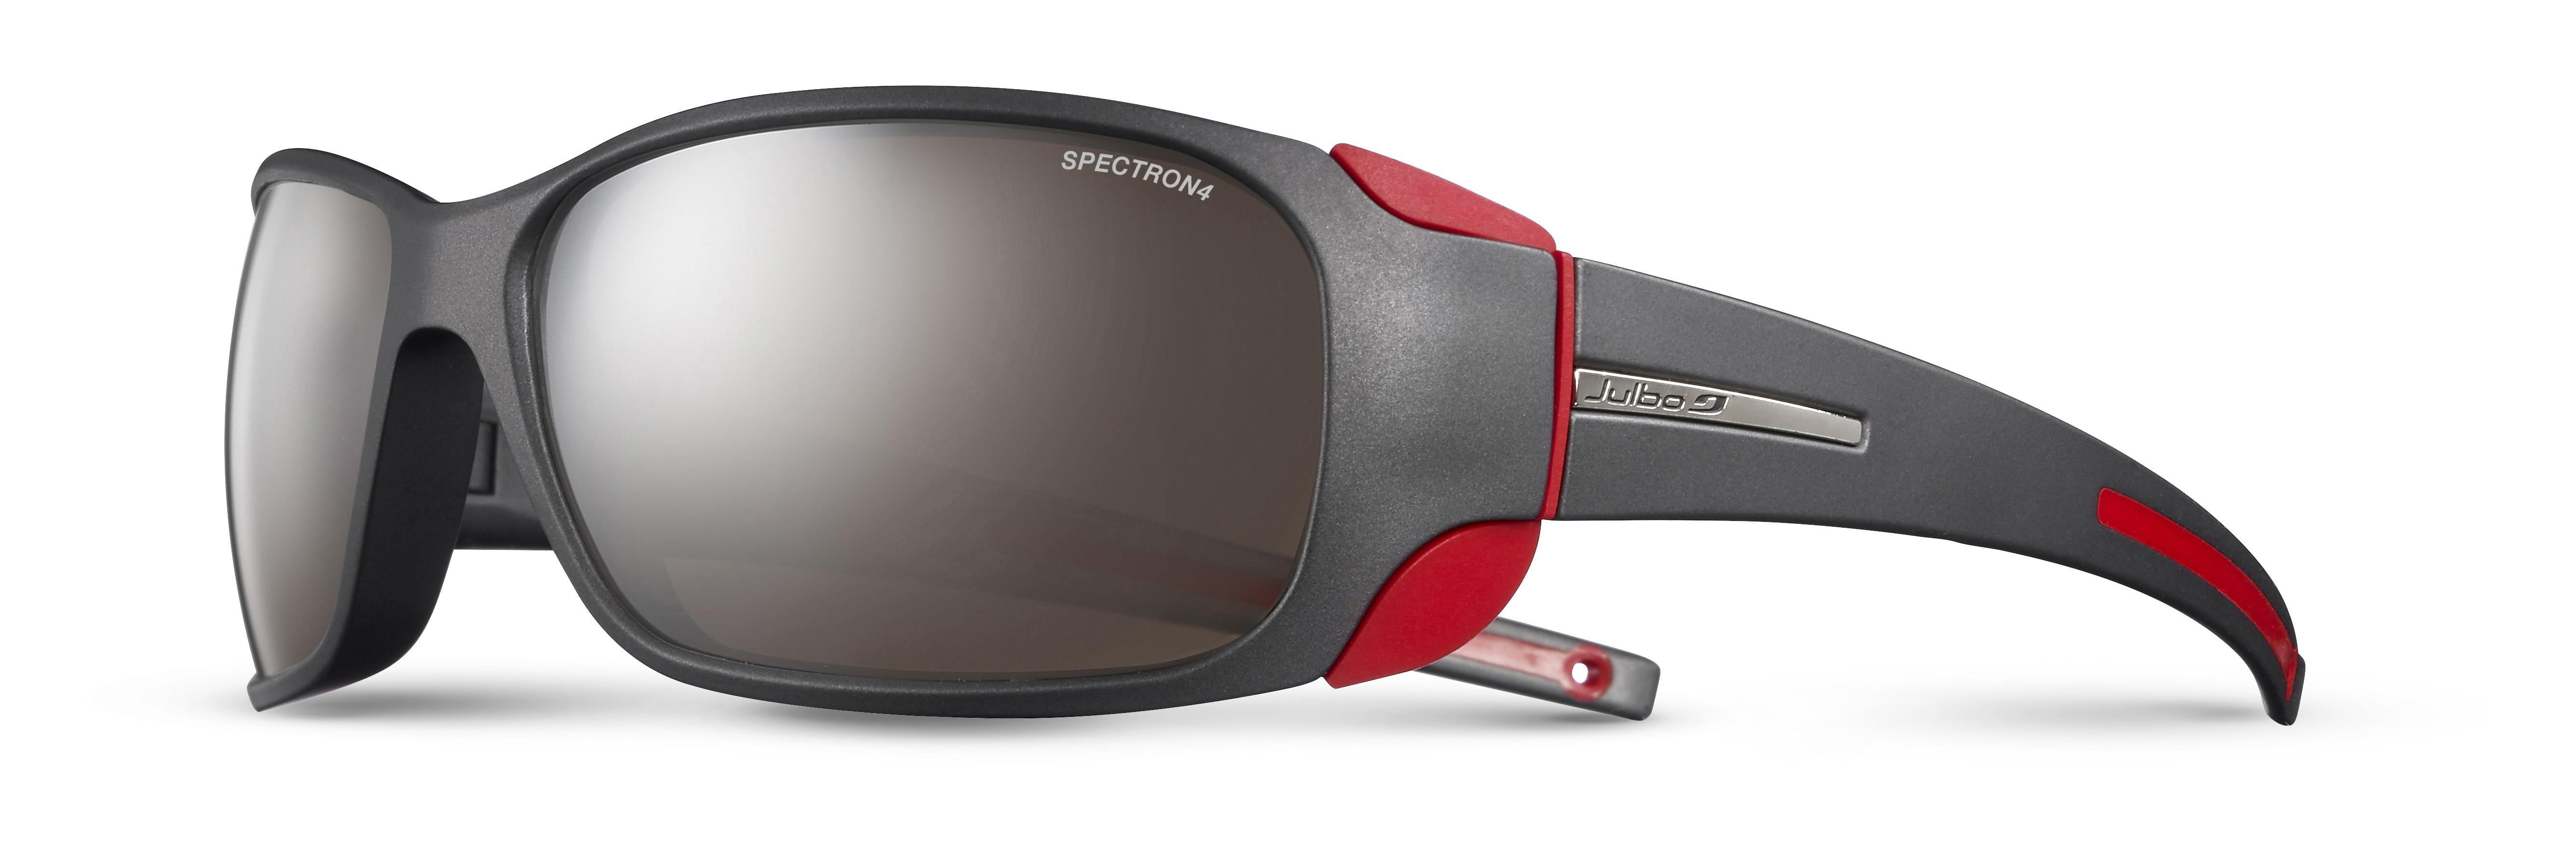 Image of   Julbo Montebianco Spectron 4 Sports Briller Large - Matt Sort / Rød